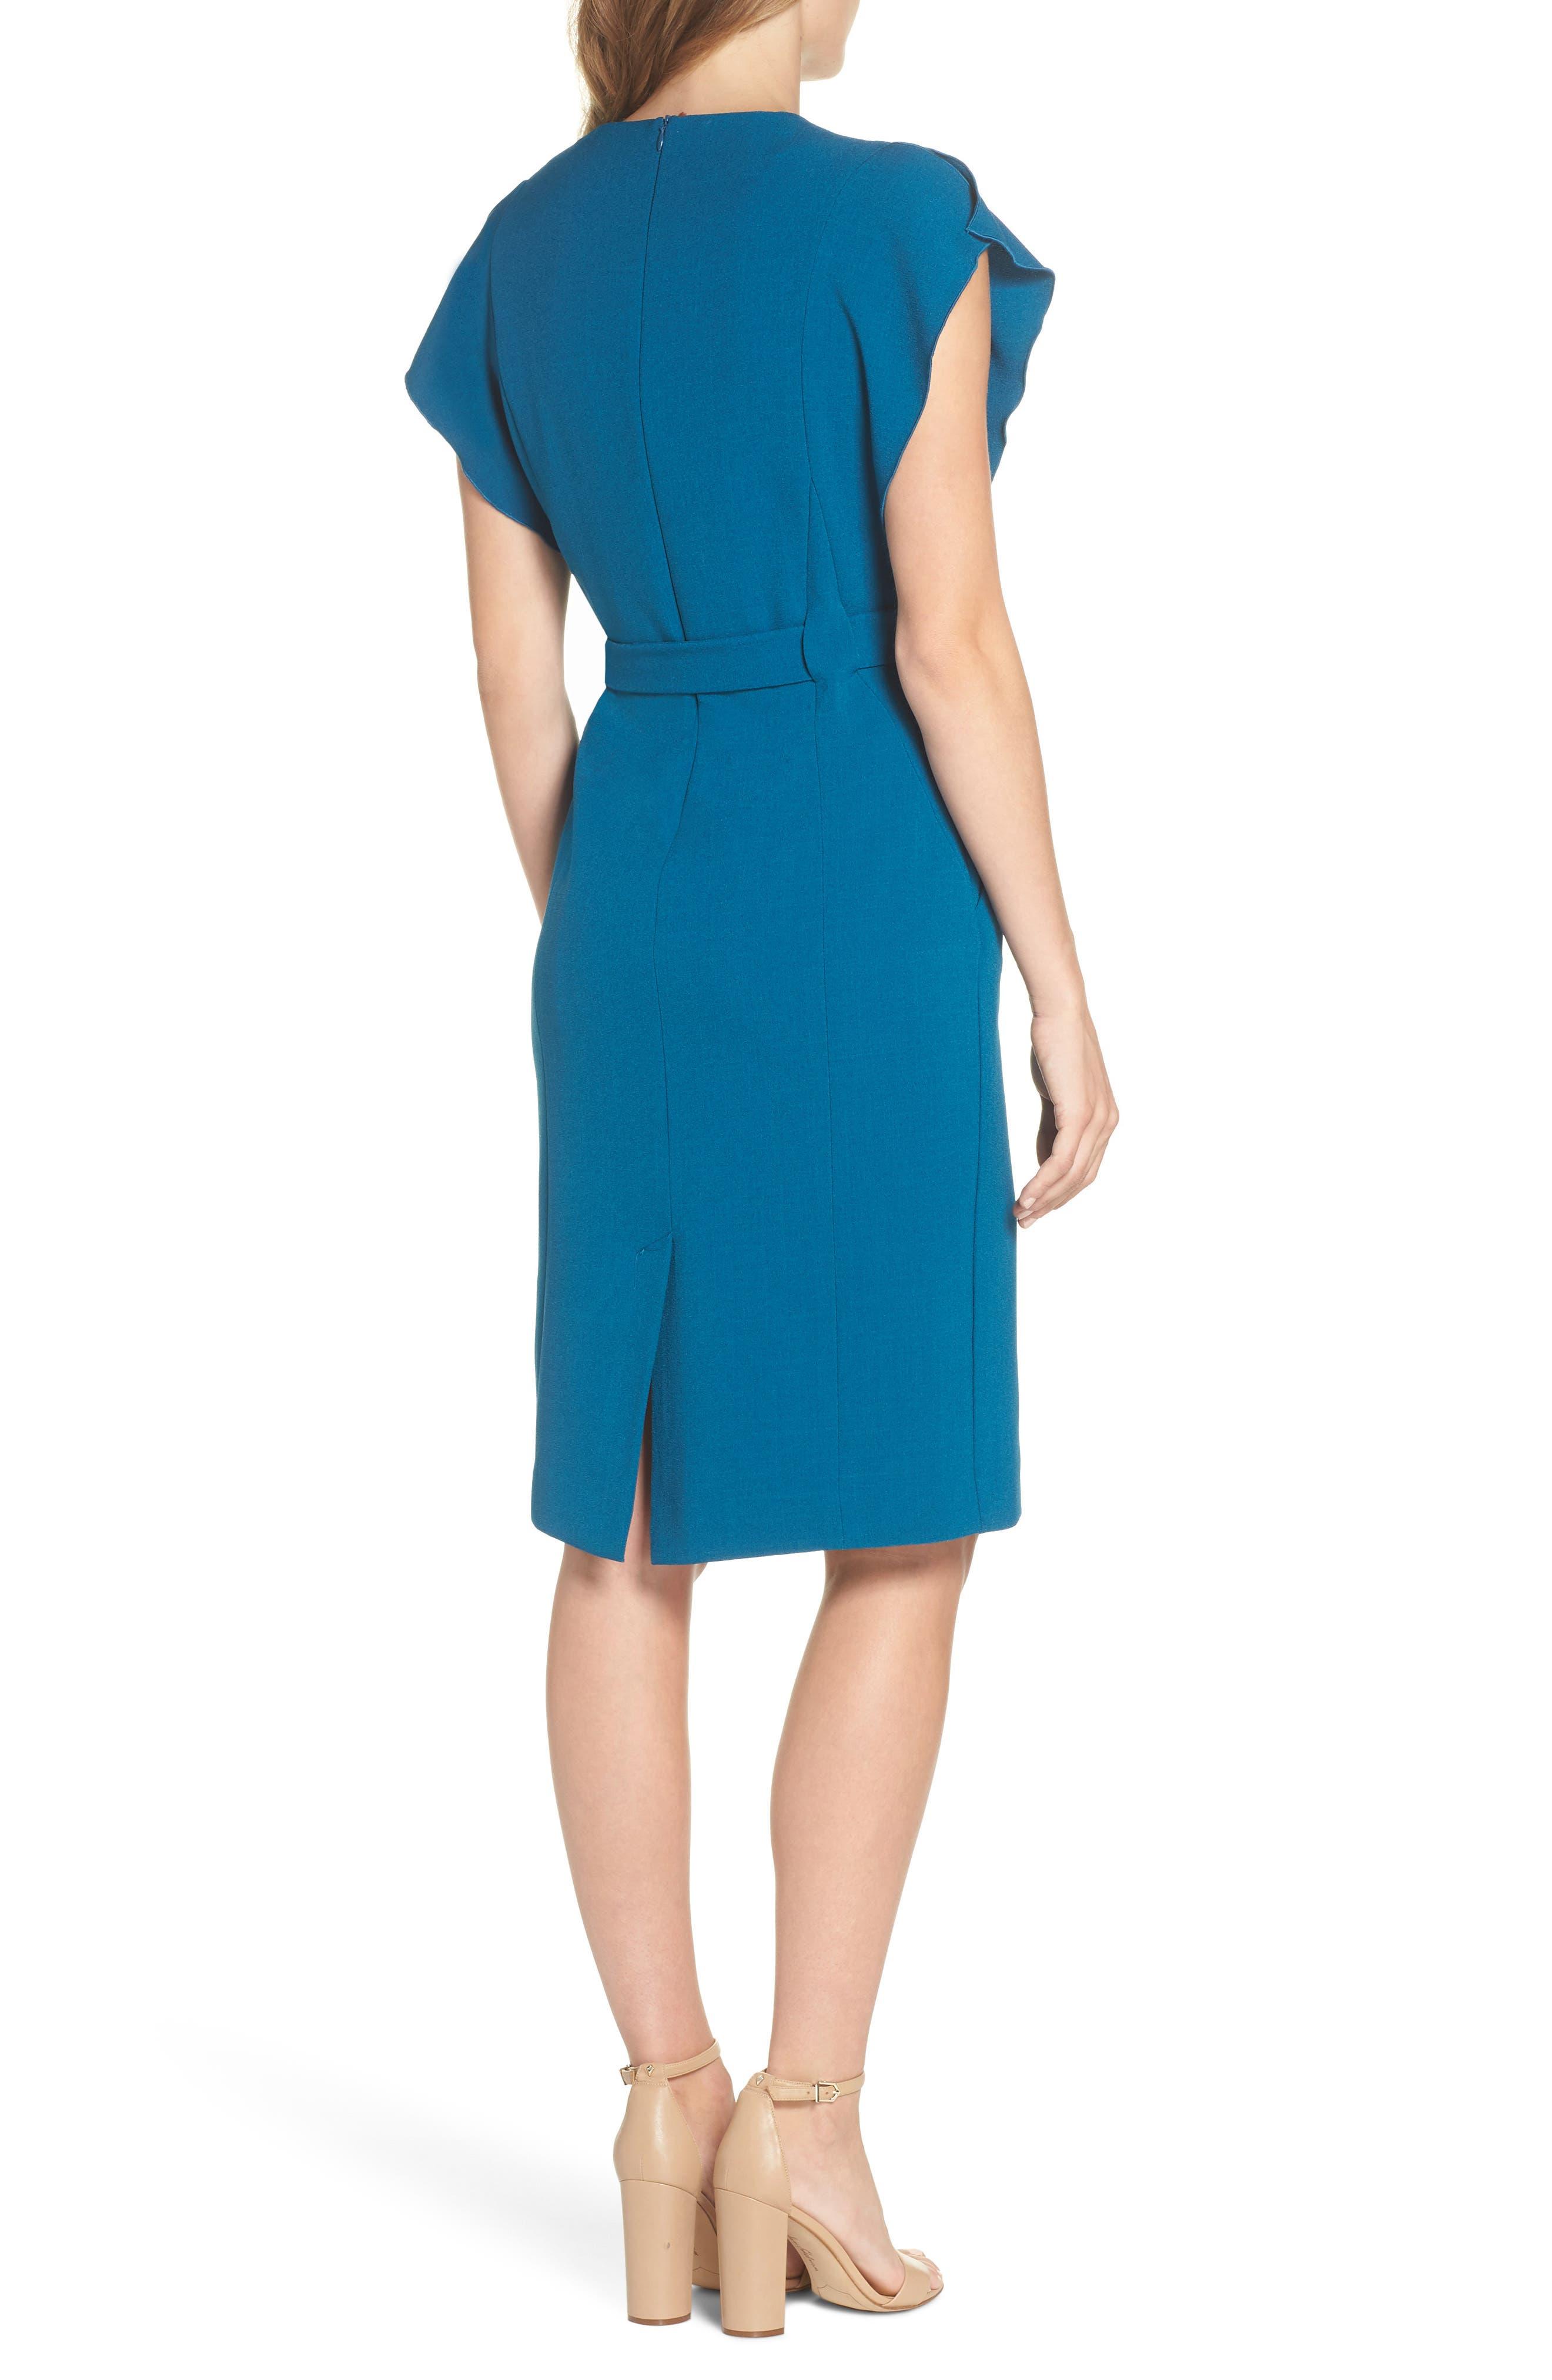 Ruffle Sleeve Sheath Dress,                             Alternate thumbnail 2, color,                             TEAL